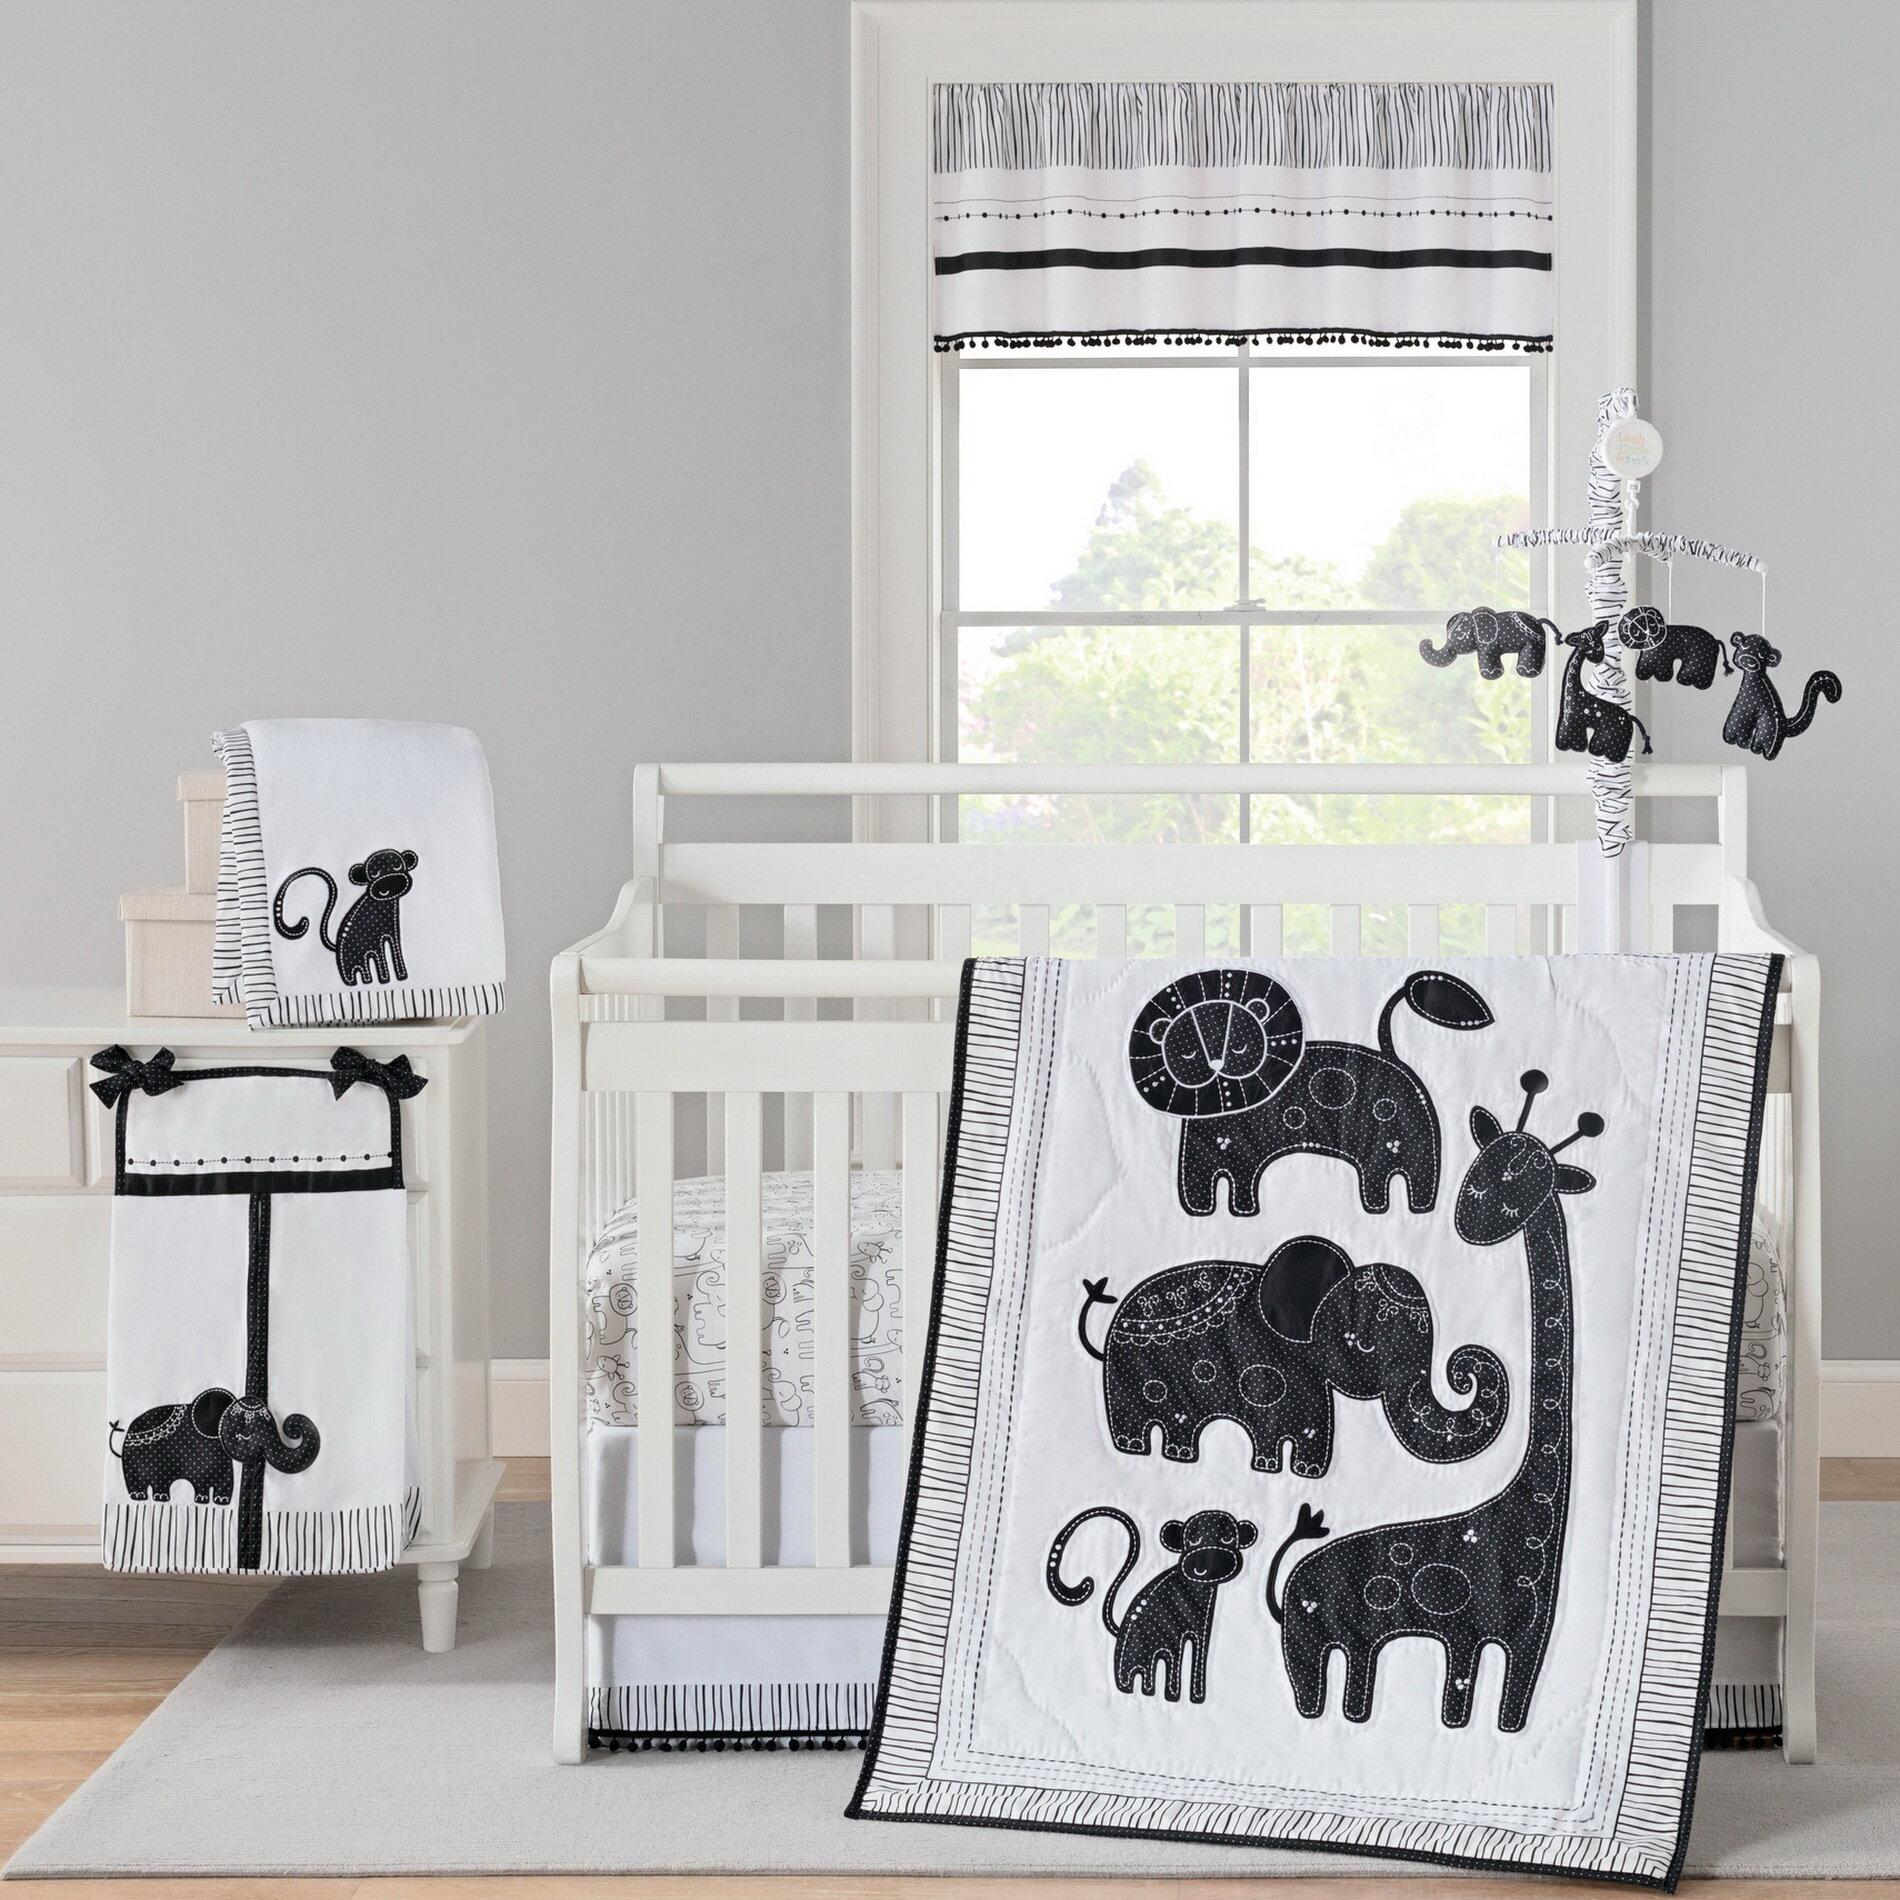 Jungle Theme Carter/'s Animals Collection 4 Piece Applique Baby Crib Bedding Set